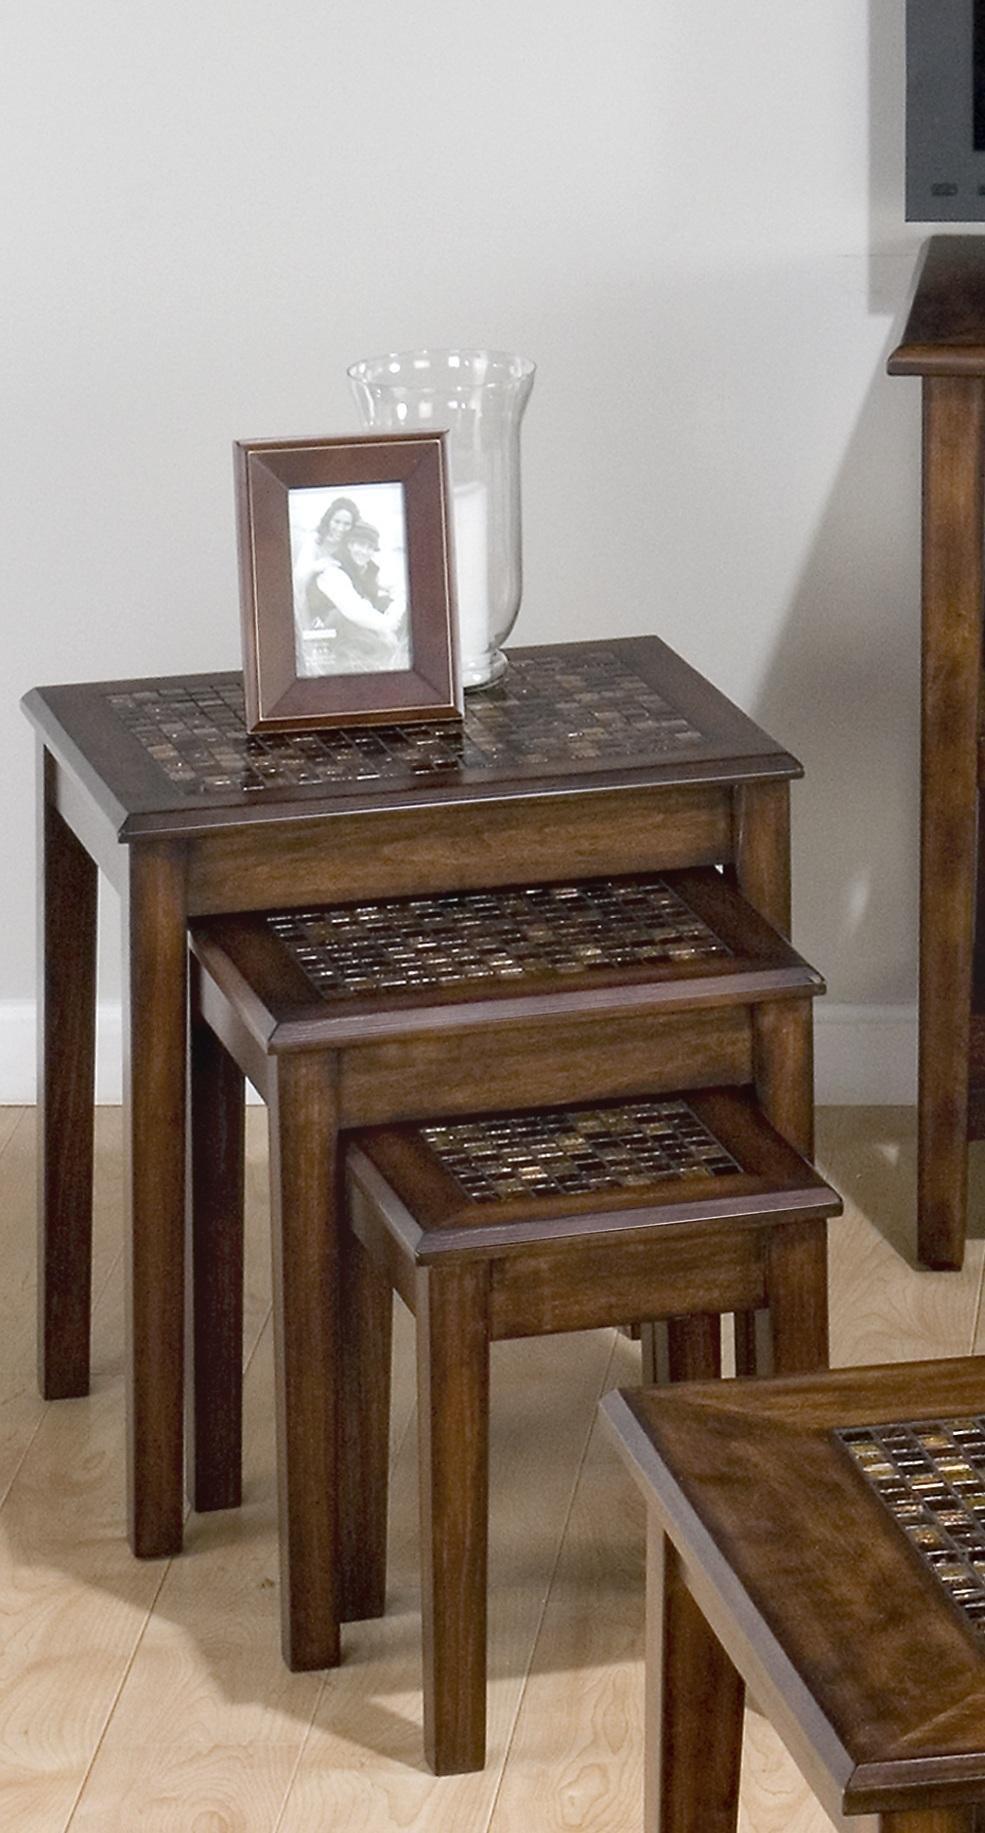 Jofran 3-Pc Nesting Table Set by Jofran